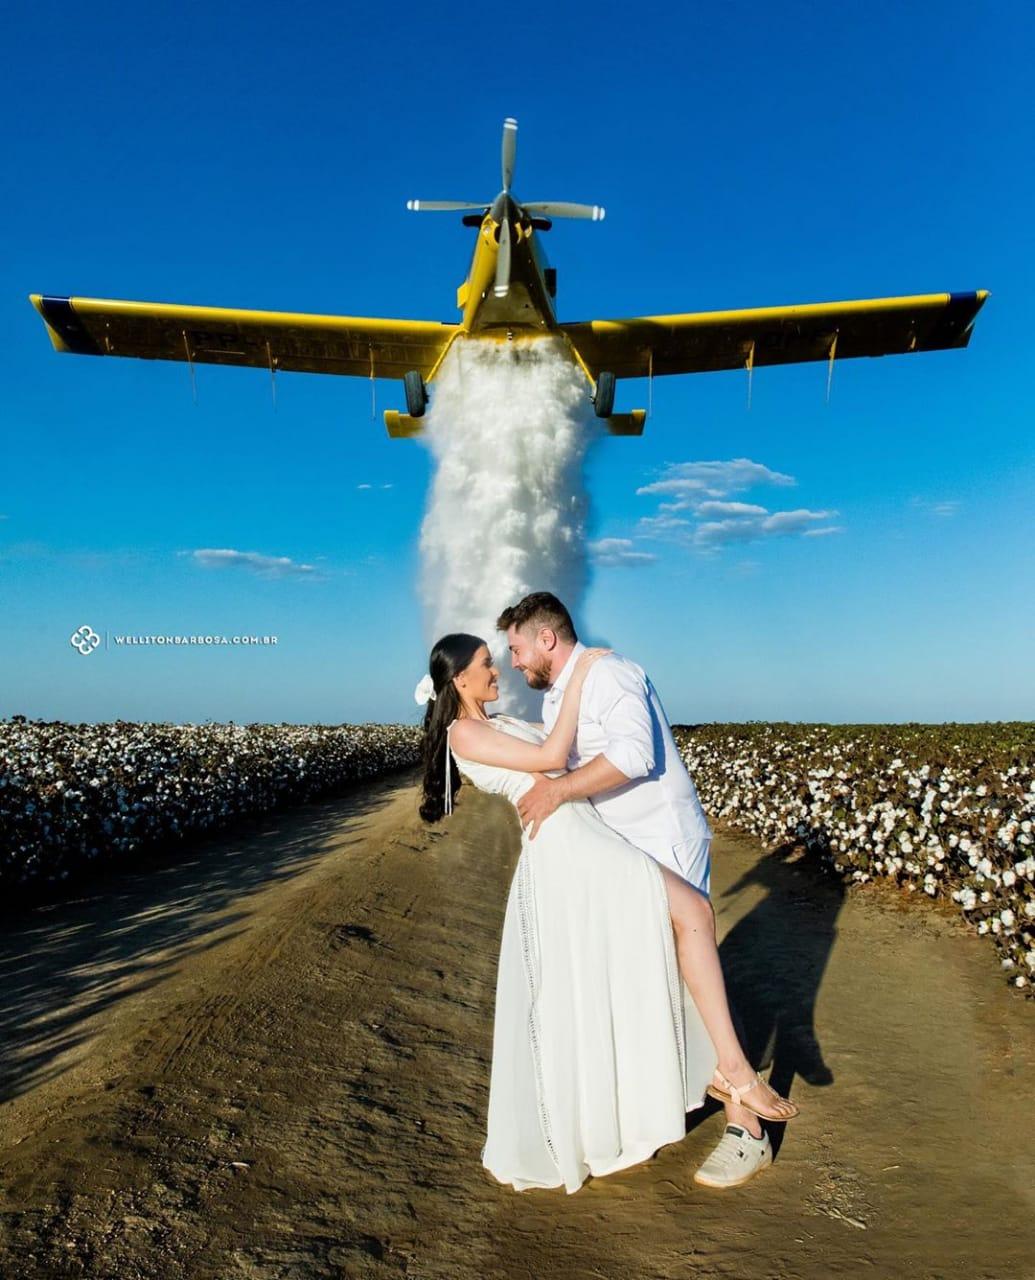 Buscando la foto de boda perfecta